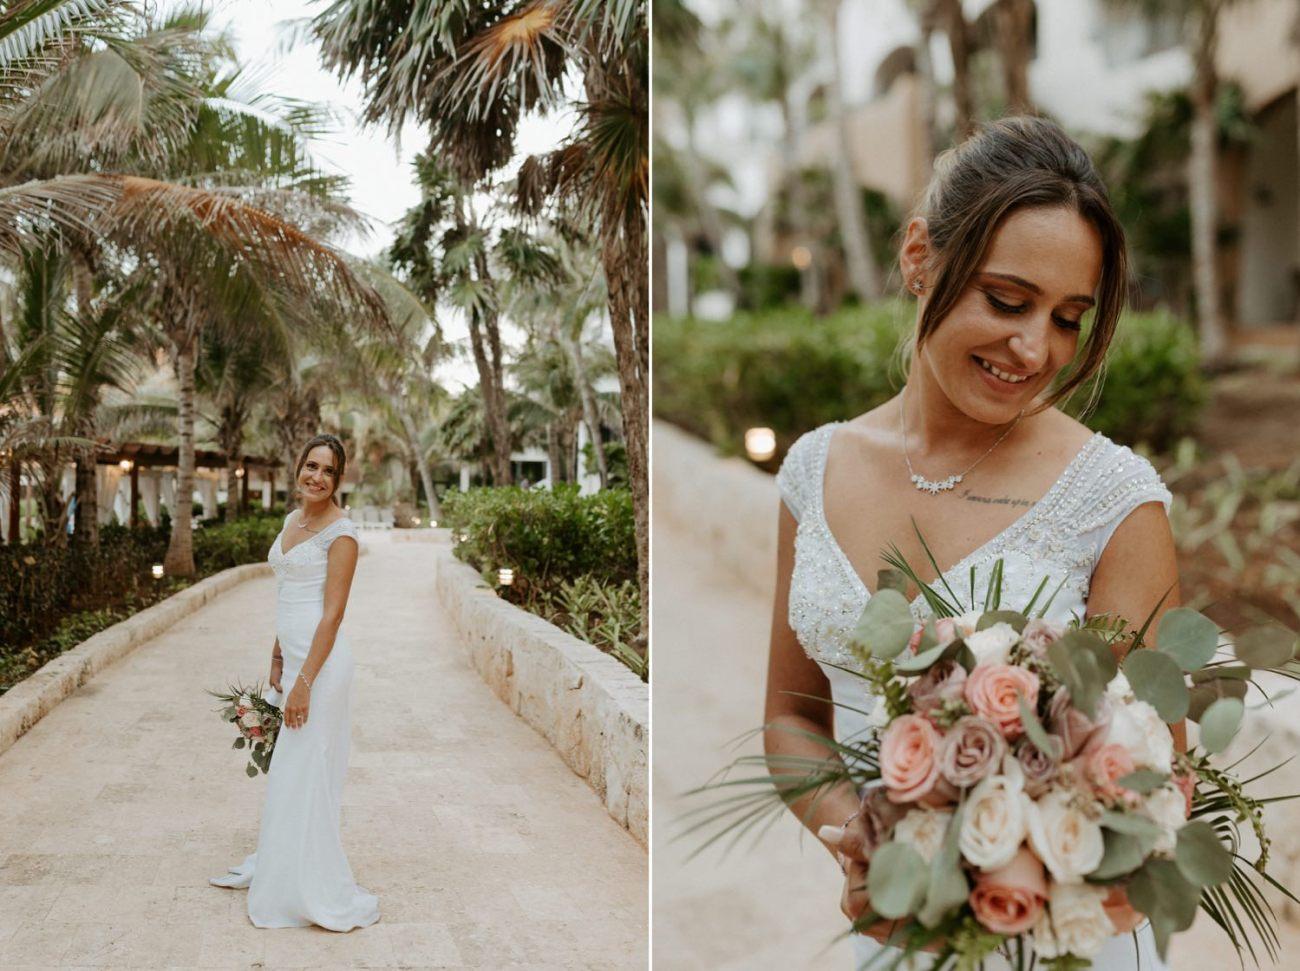 Cancun Destination Wedding Mexico Tulum Wedding Photographer Anais Possamai Photography 057